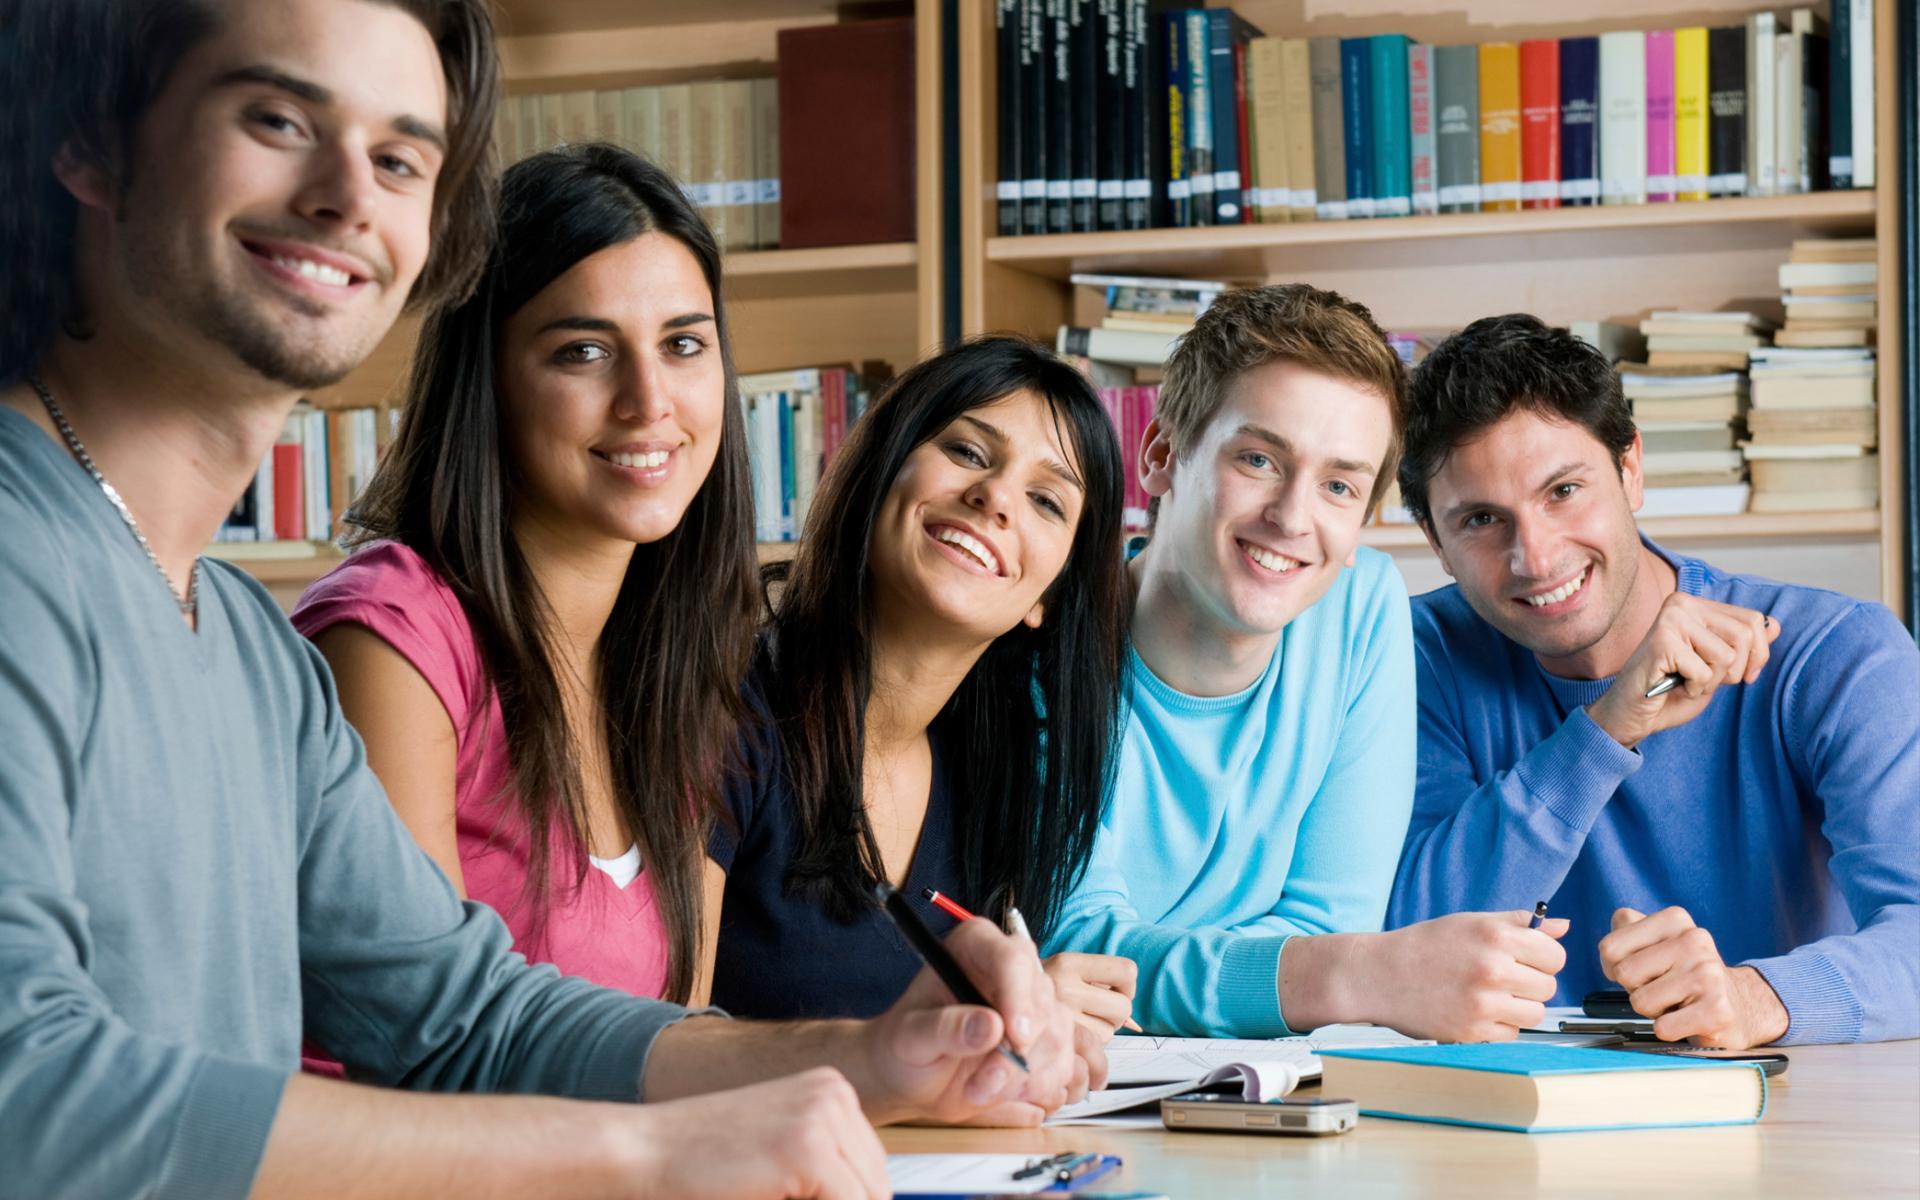 Öğrenciyim, Kredi Kartı Almalı Mıyım?